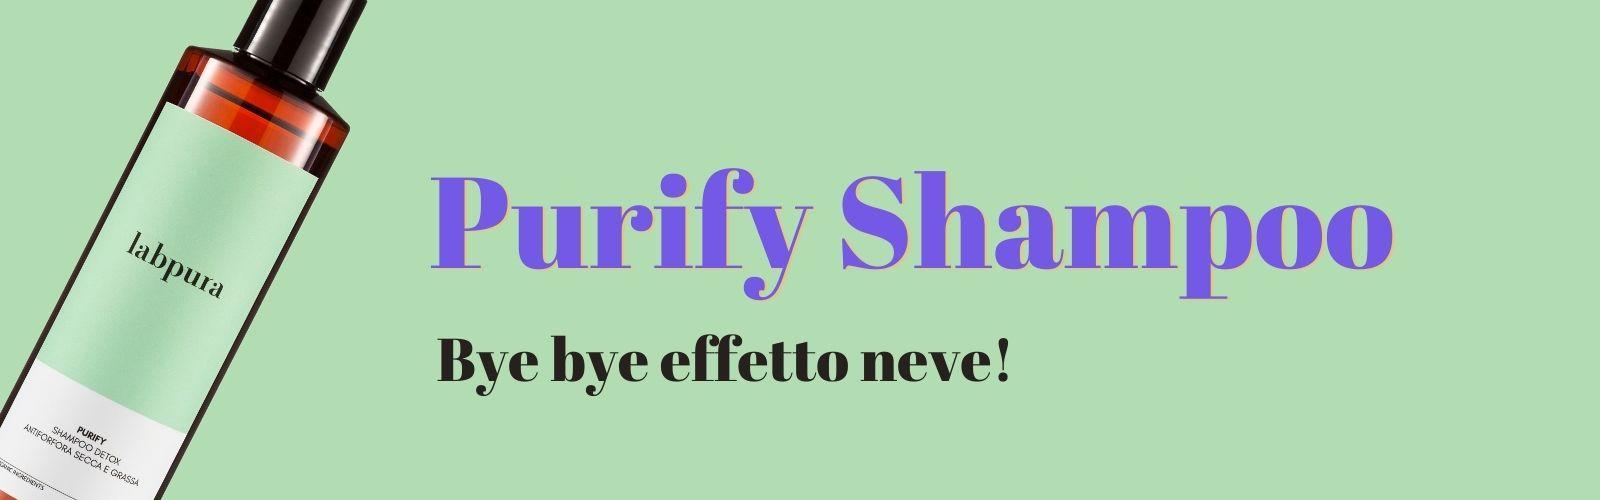 shampoo antiforfora online